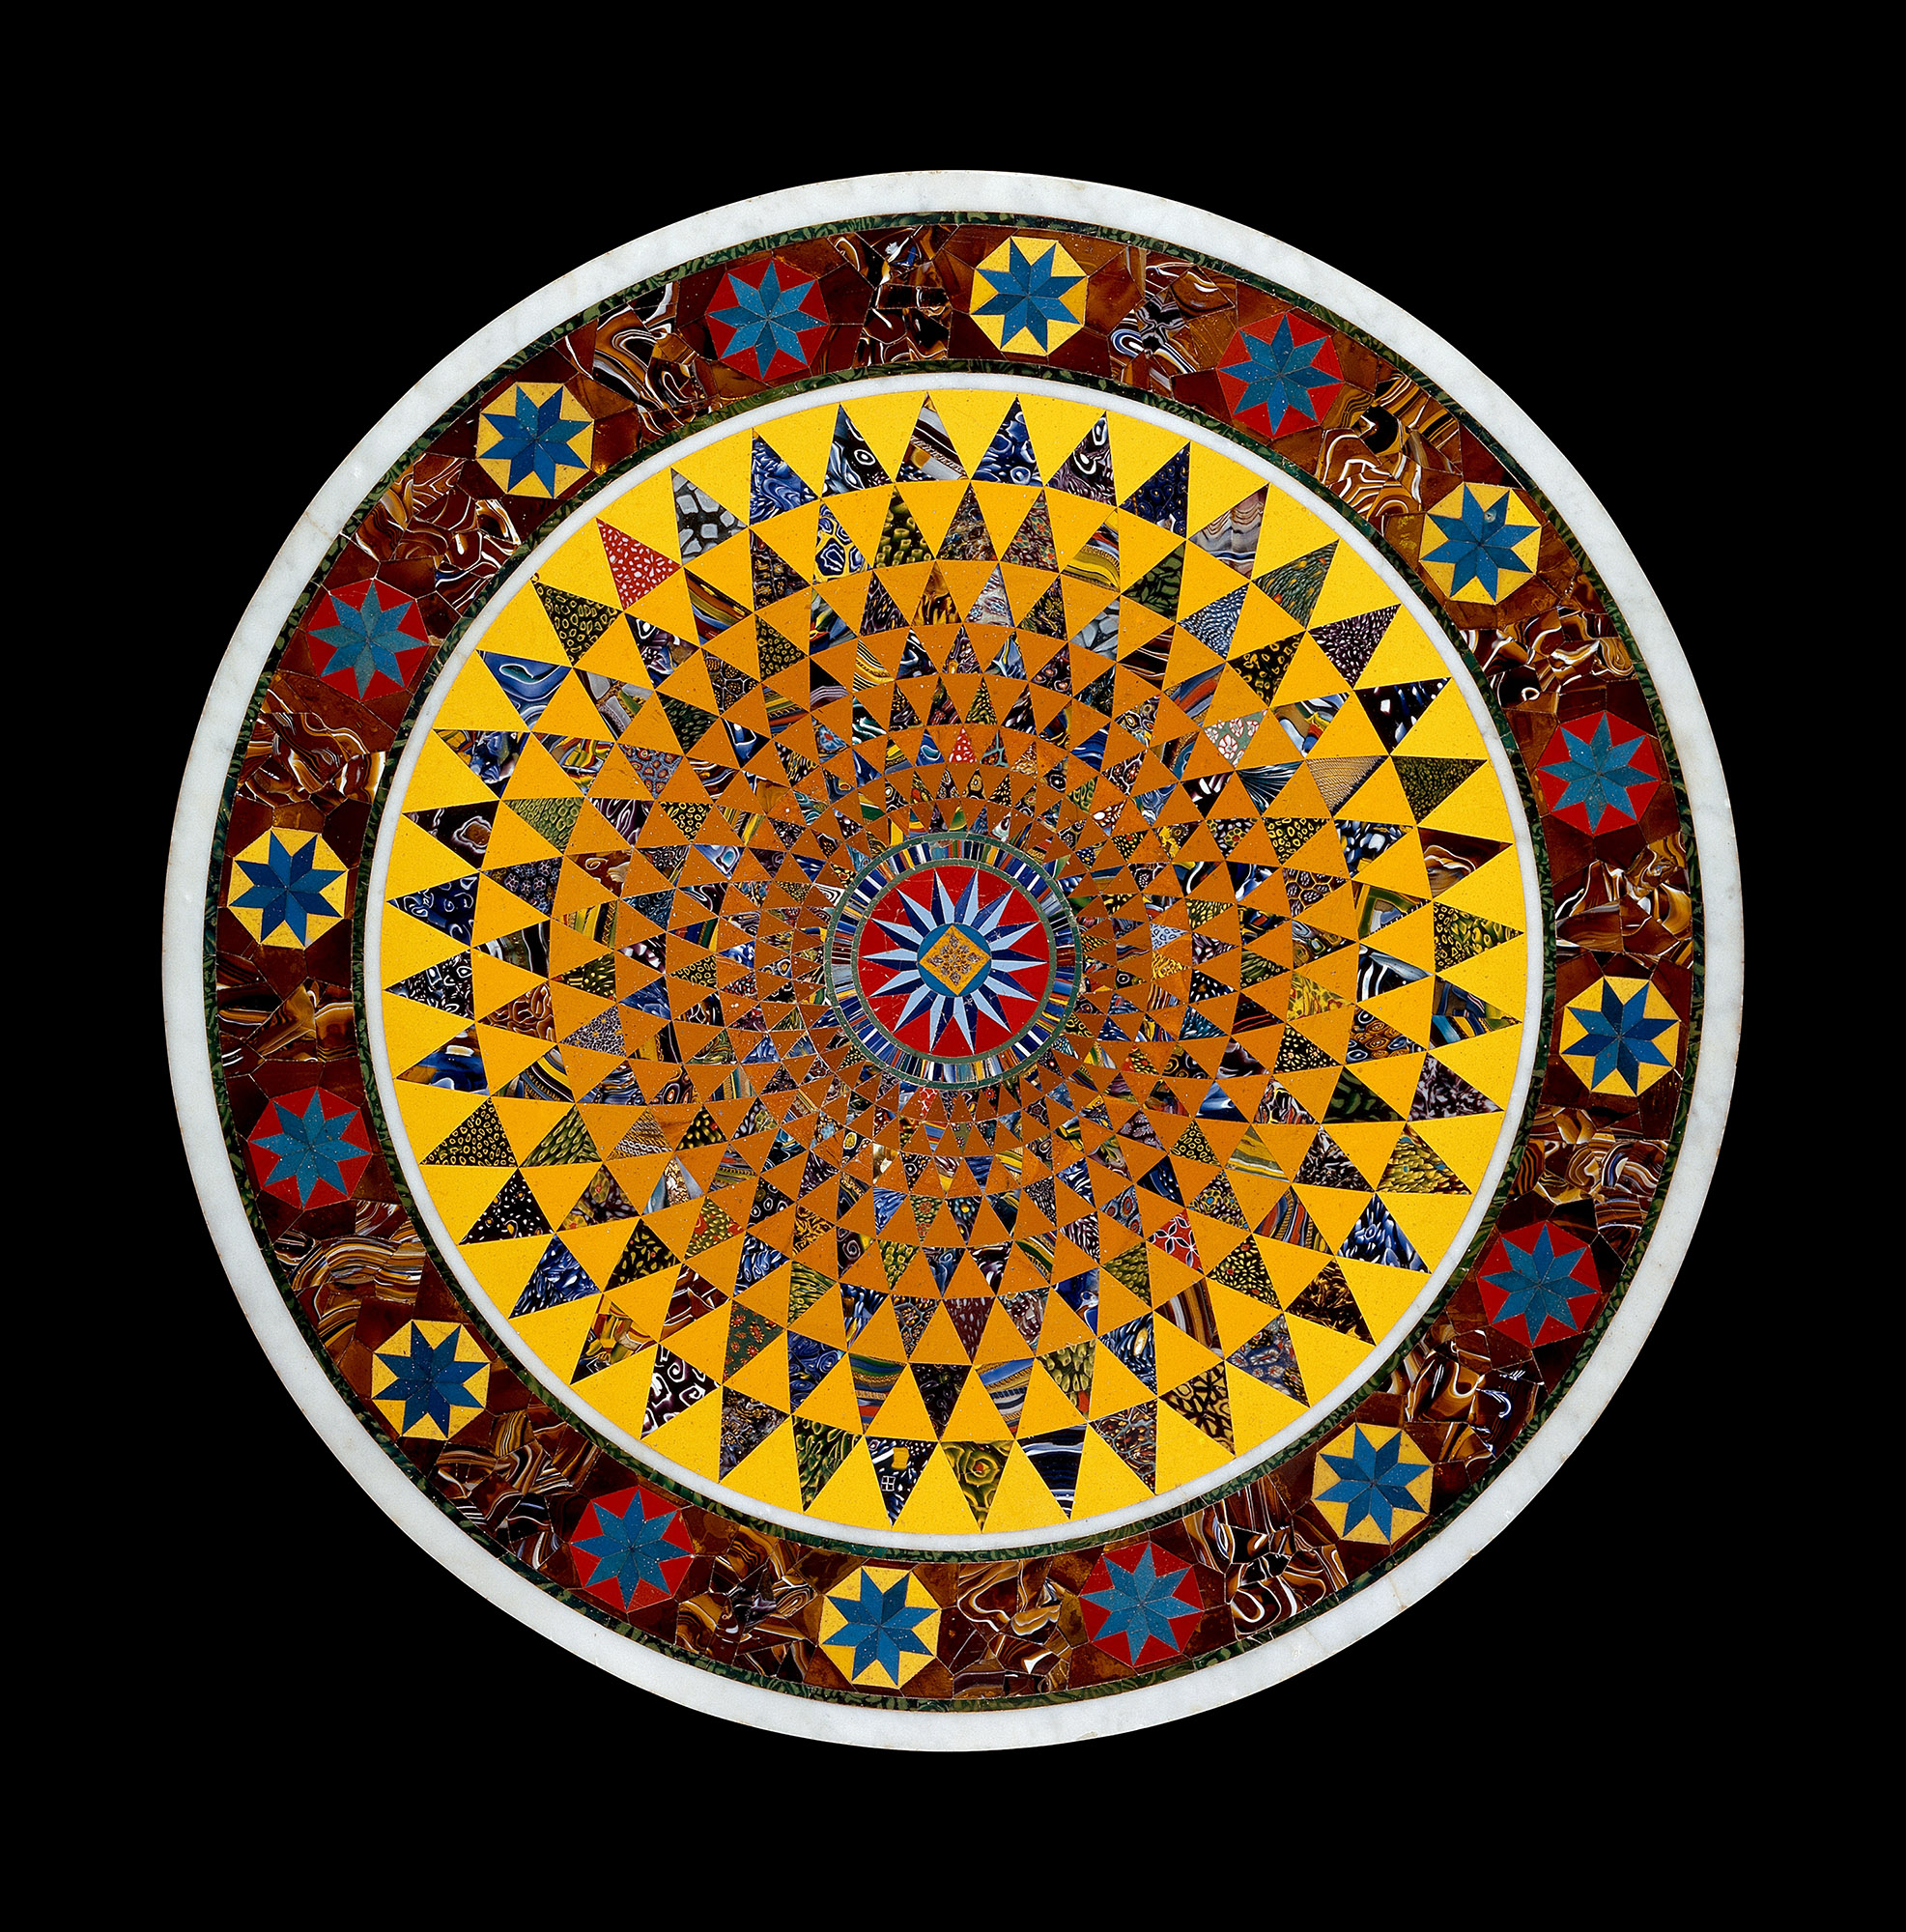 Mosaic Glass Tabletop